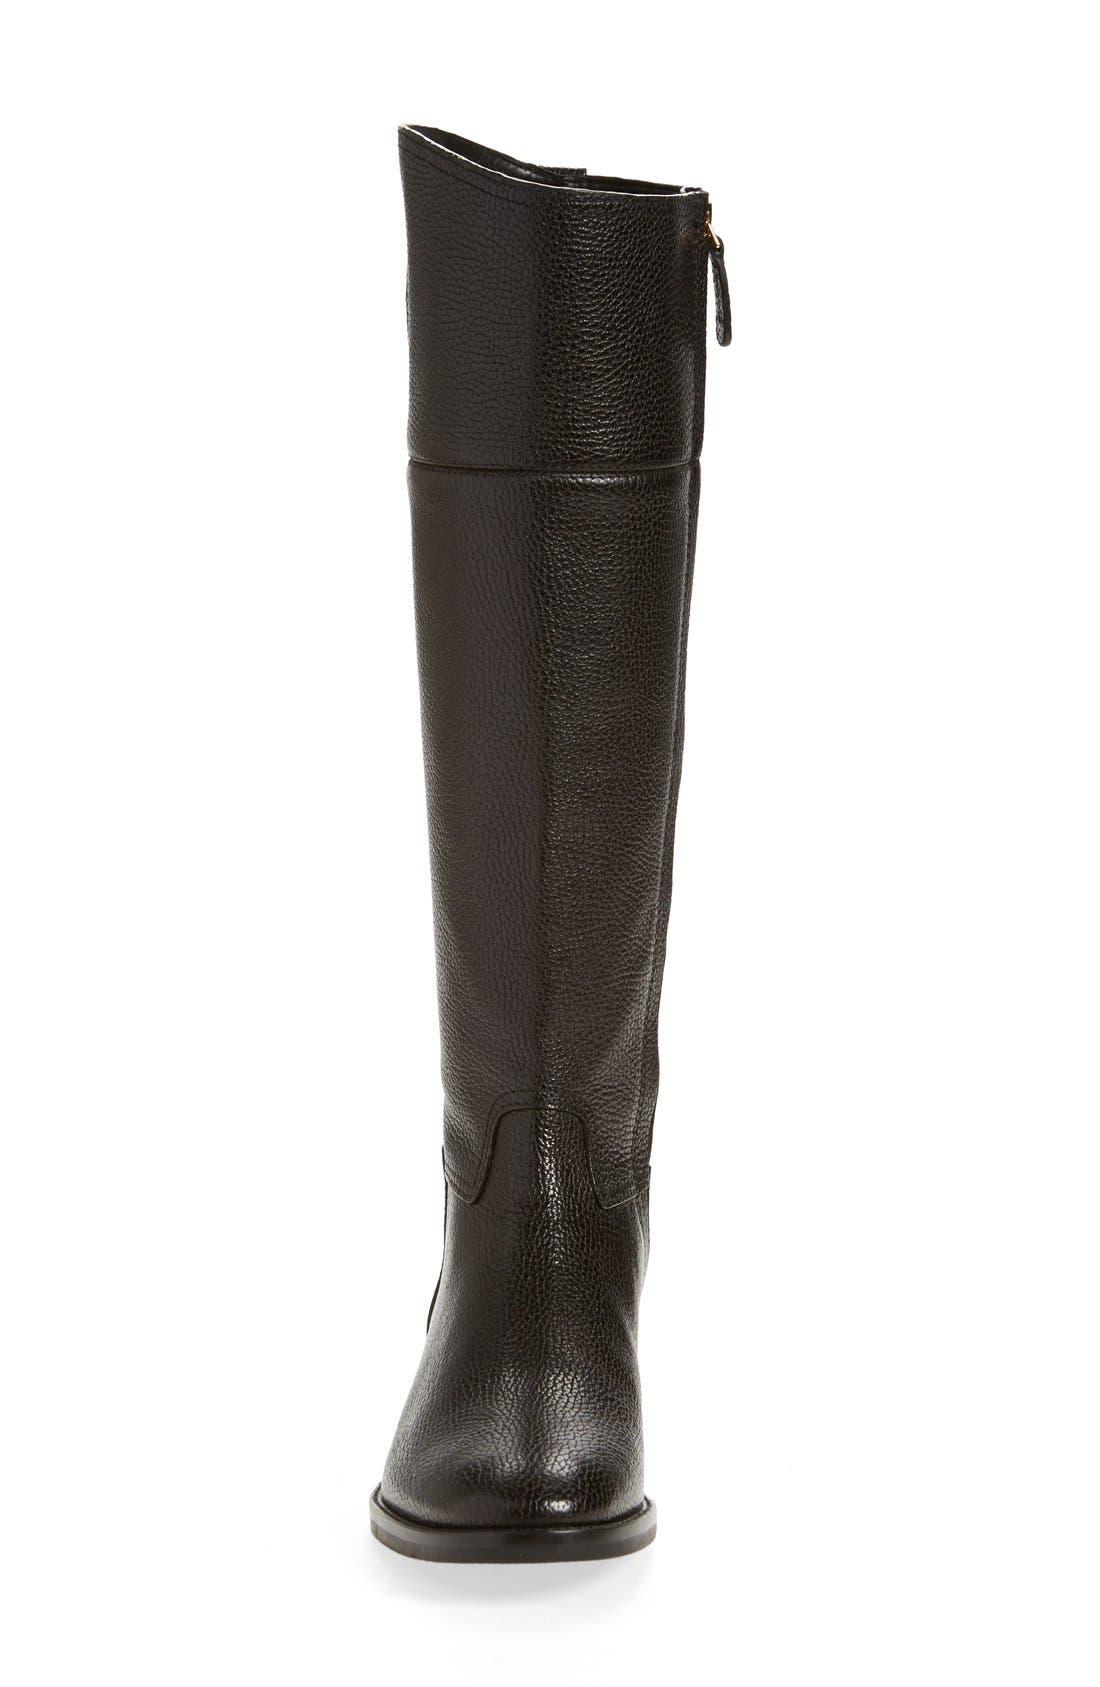 Alternate Image 3  - Tory Burch 'Junction' Riding Boot (Women) (Wide Calf)